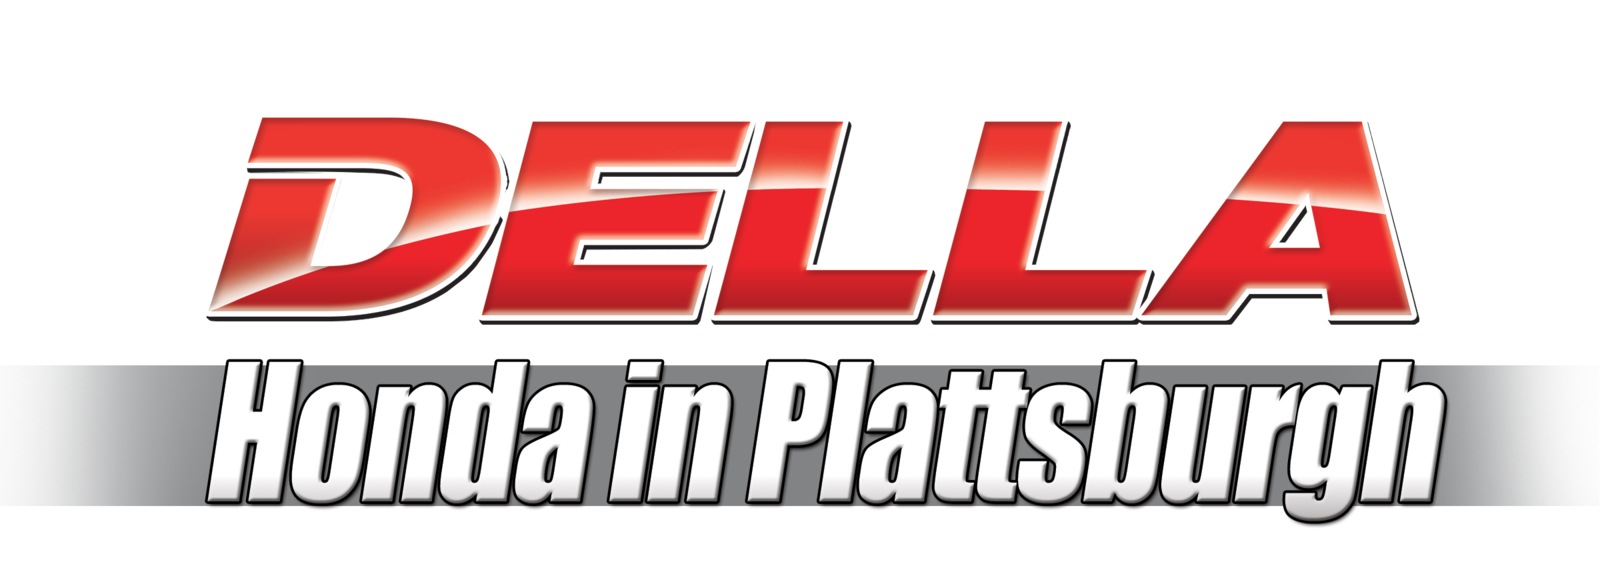 DELLA Honda of Plattsburgh - Plattsburgh, NY: Read Consumer reviews